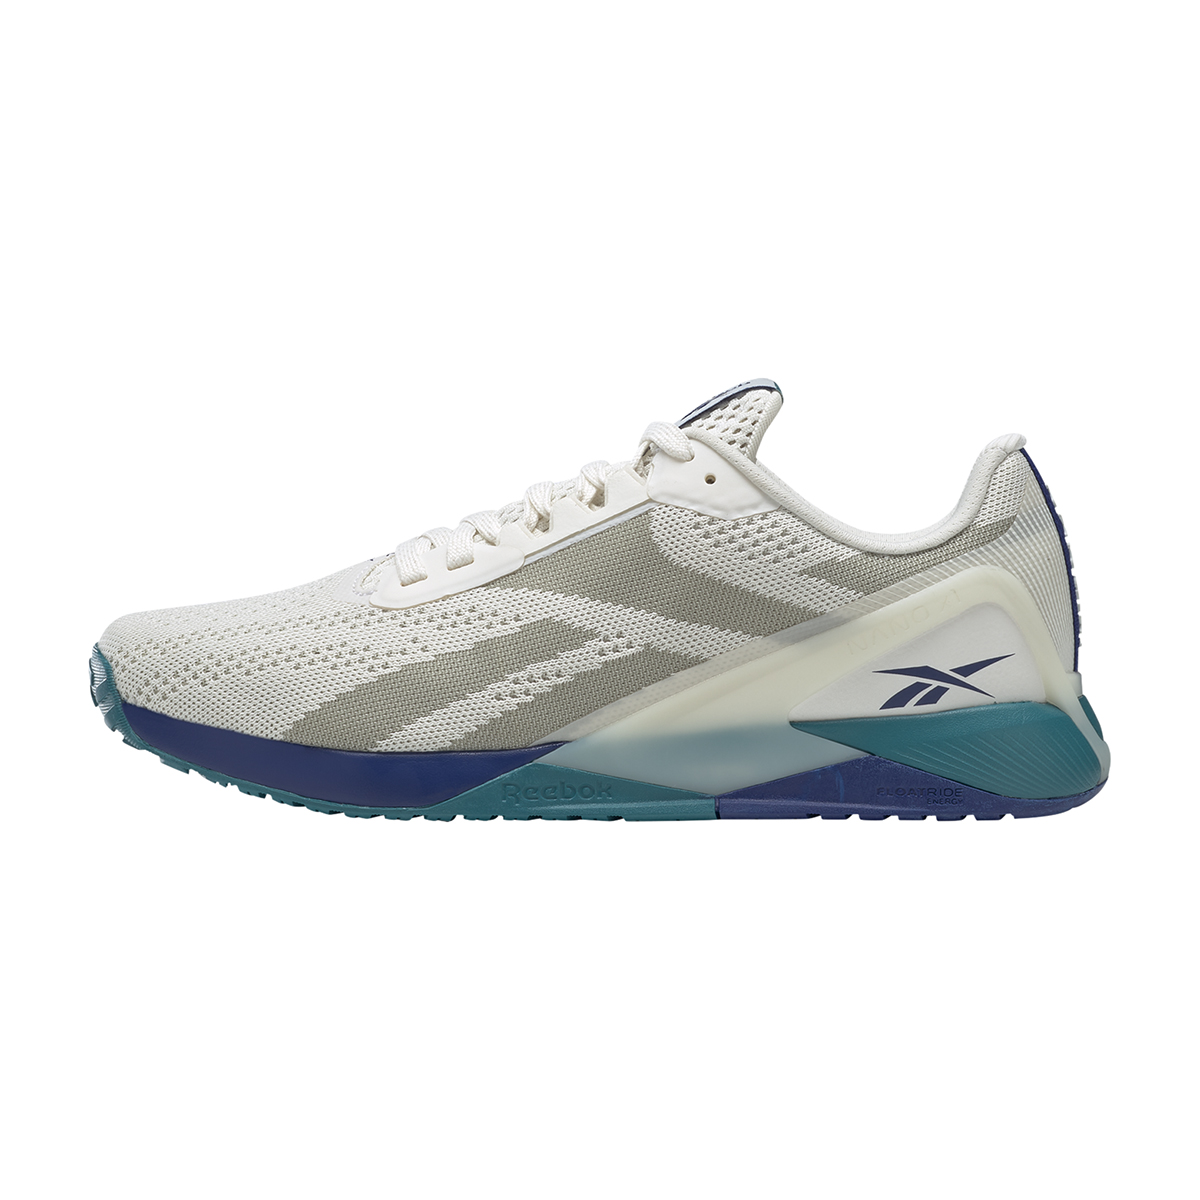 Men's Reebok Nano X1 Training Shoe - Color: Chalk/Classic Cobalt/Seaport Teal   - Size: 6 - Width: Regular, Chalk/Classic Cobalt/Seaport Teal, large, image 2